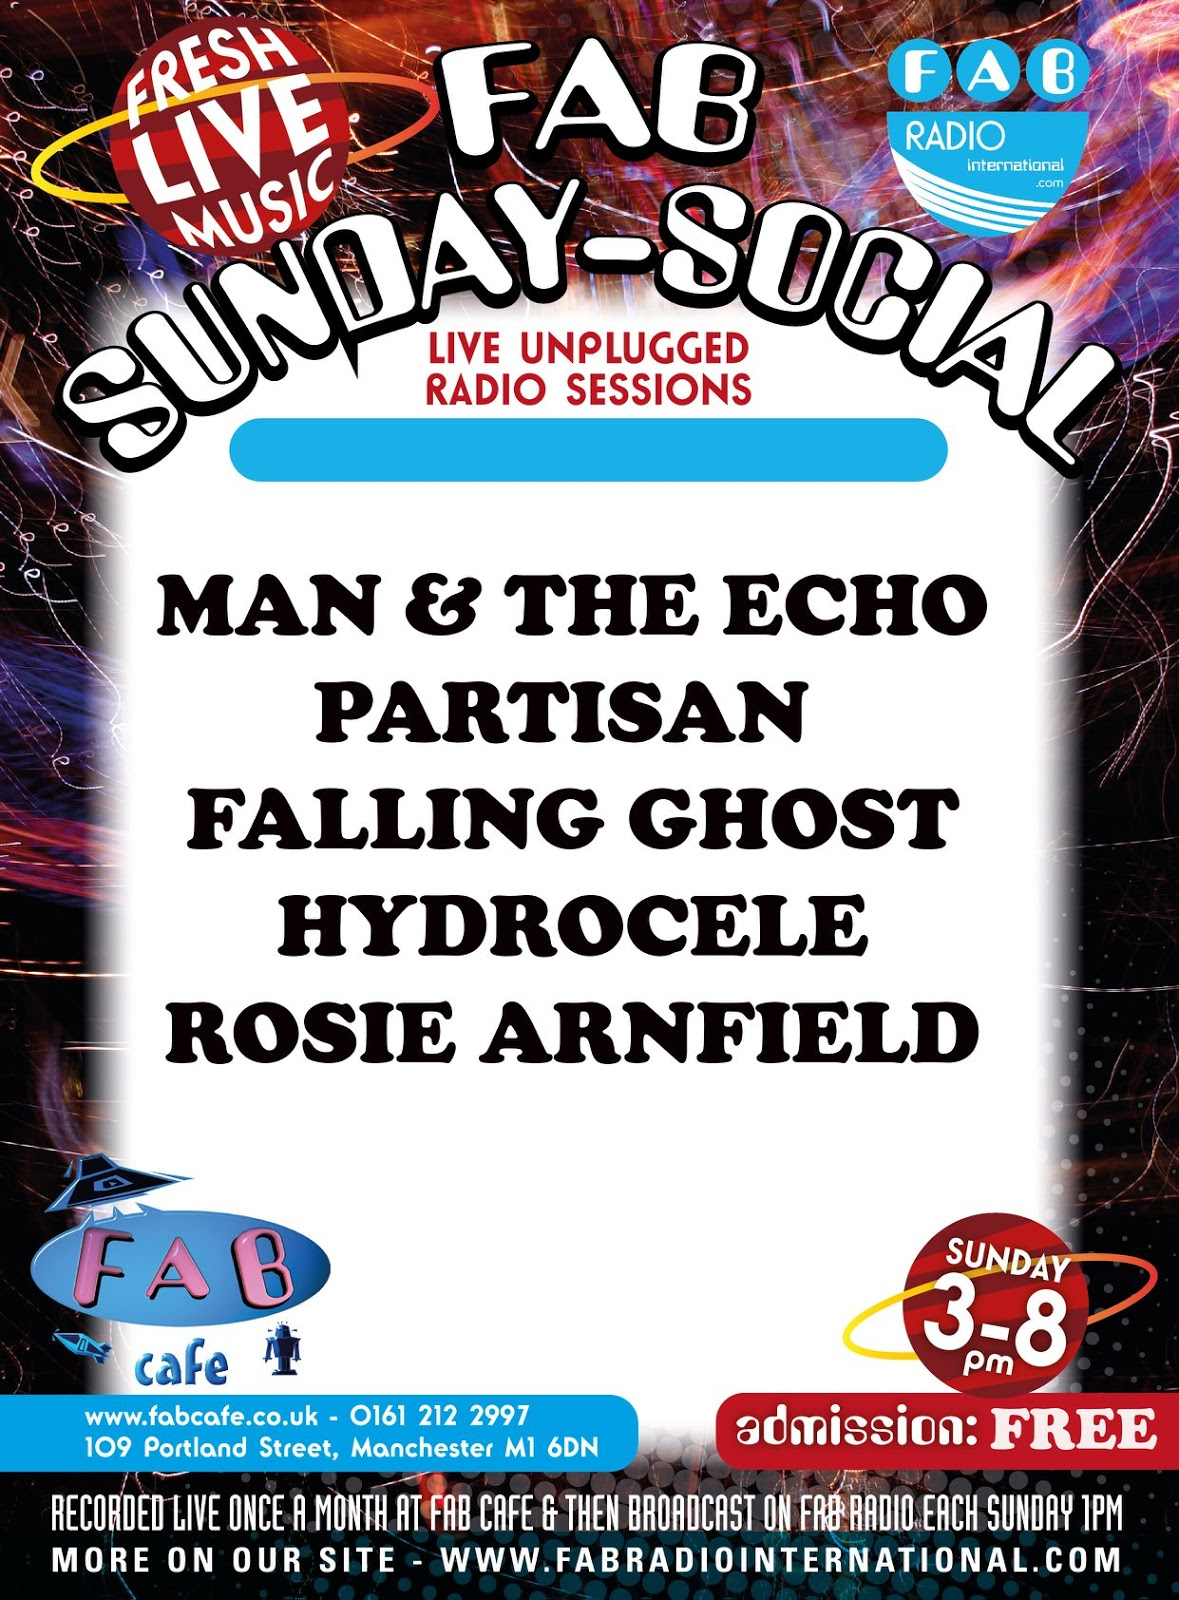 FAB Radio Sunday Social